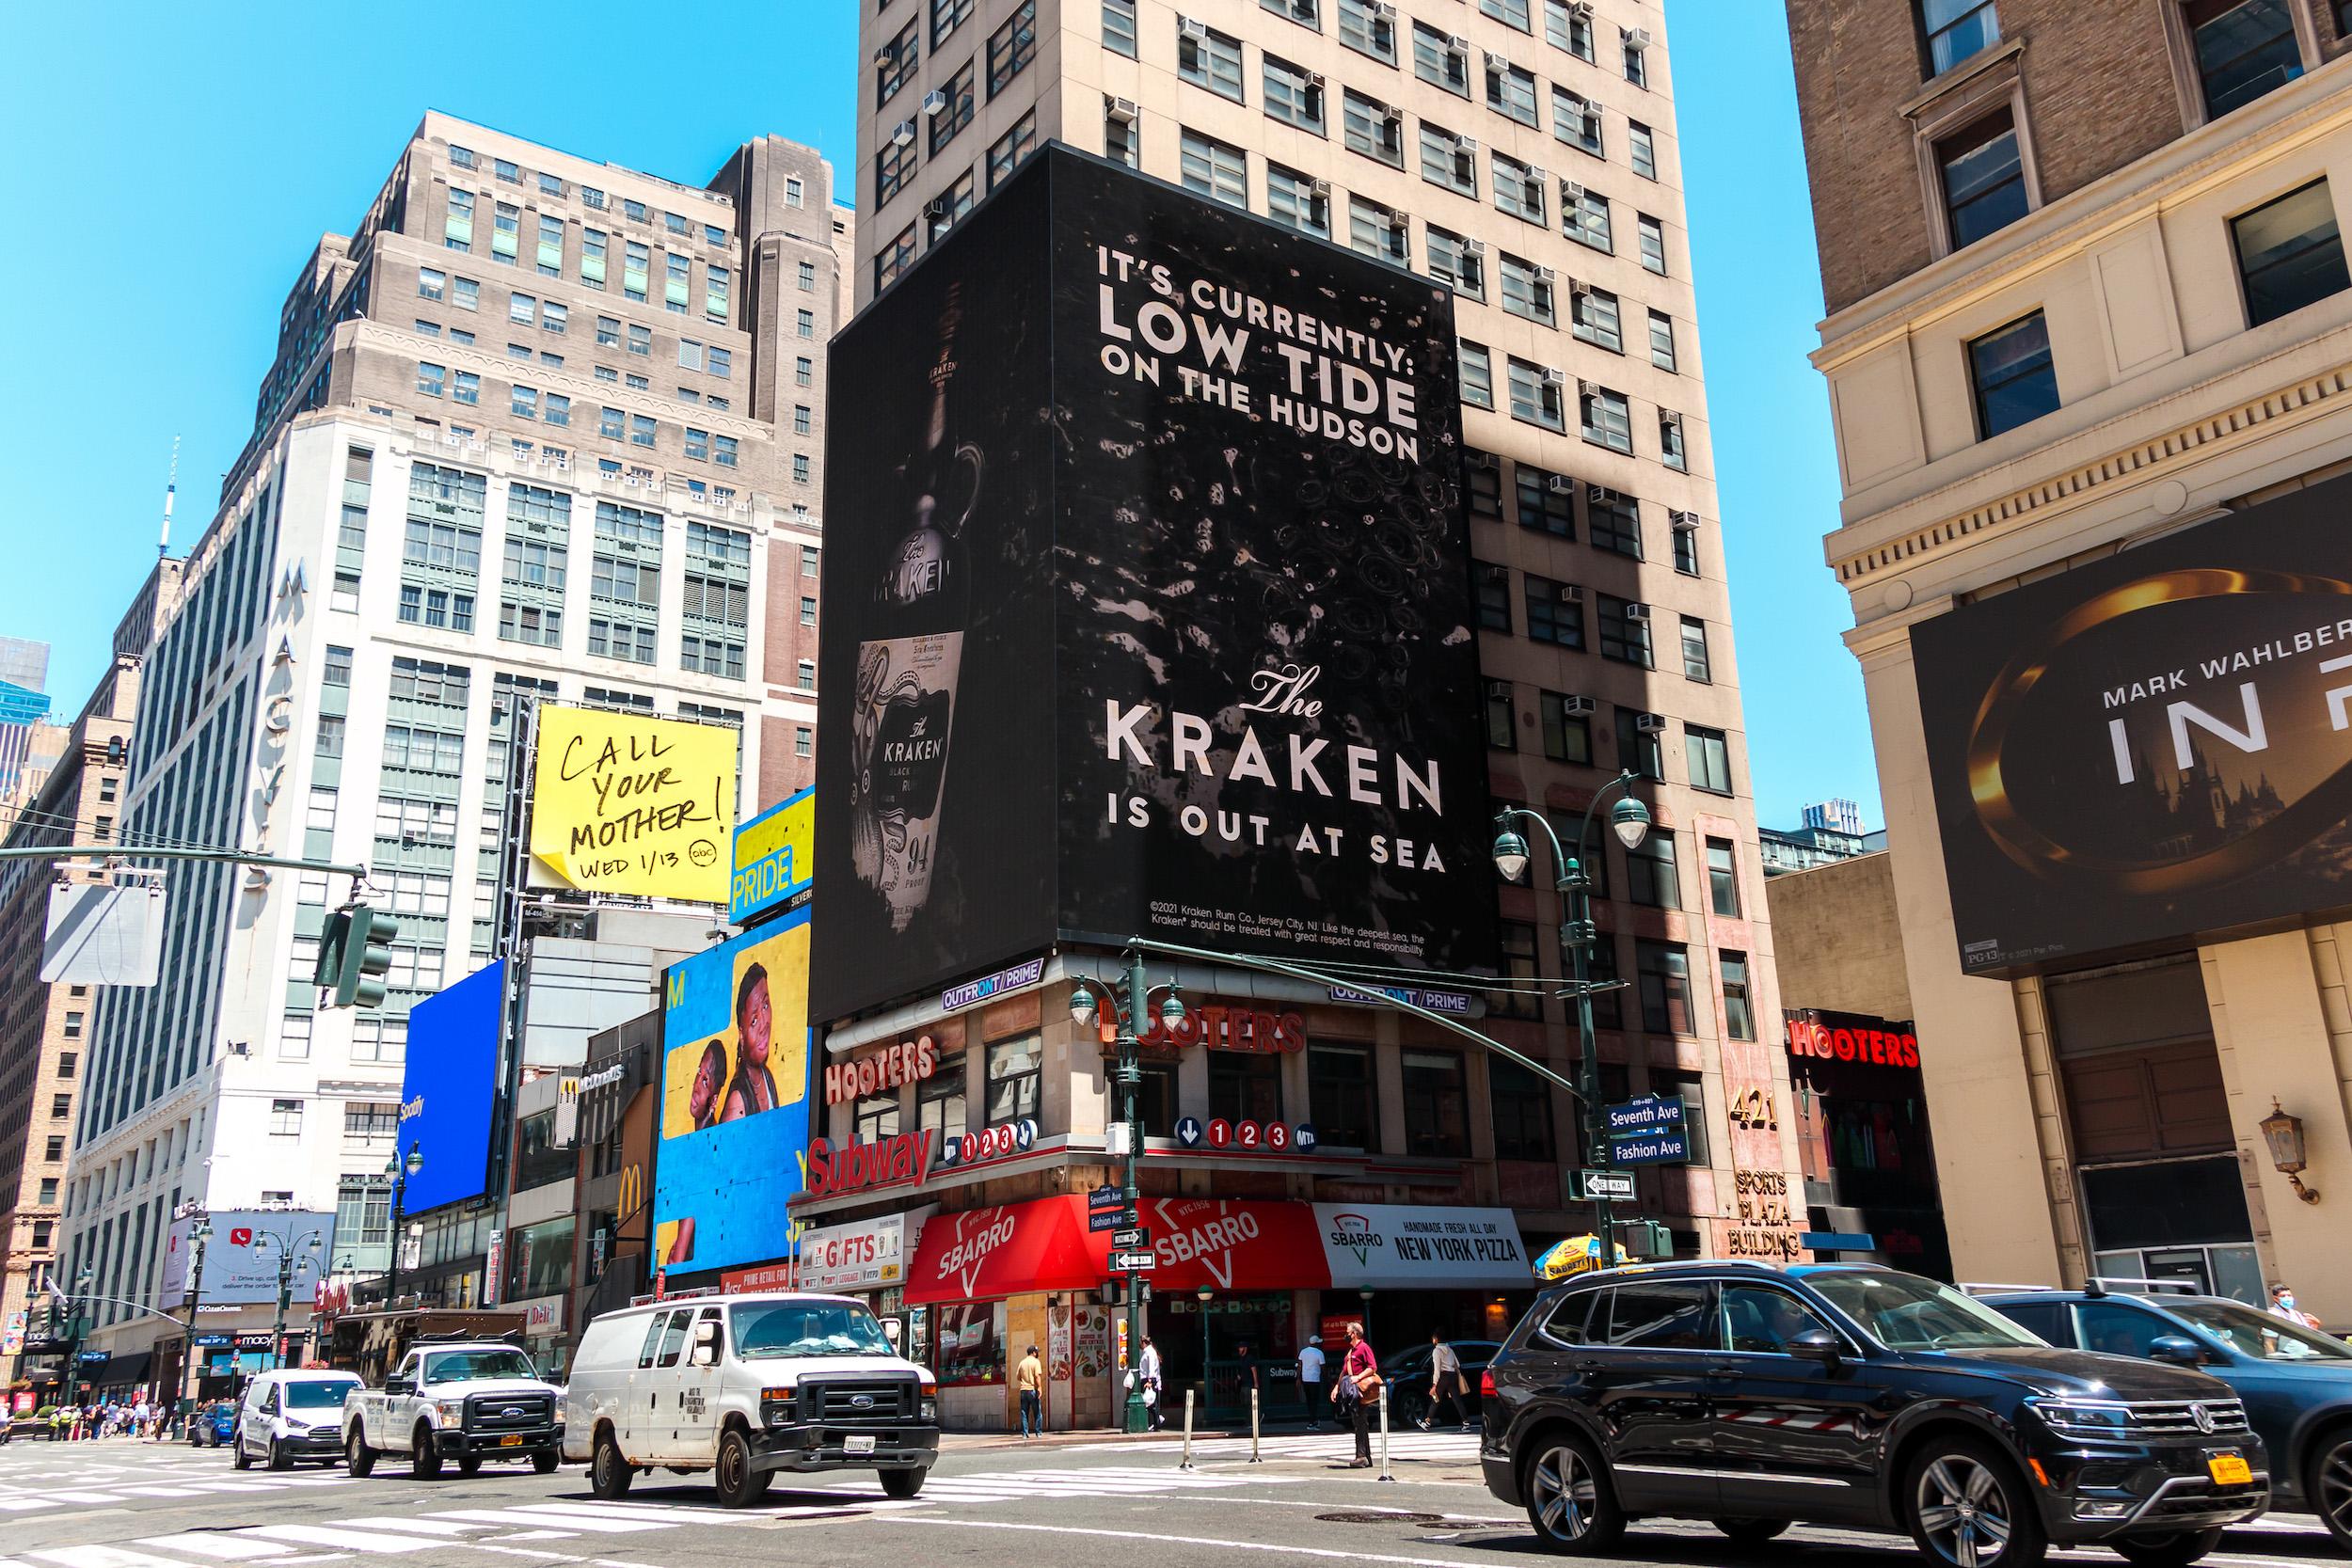 Kraken - Grand Visual, Havas, Talon OOH.